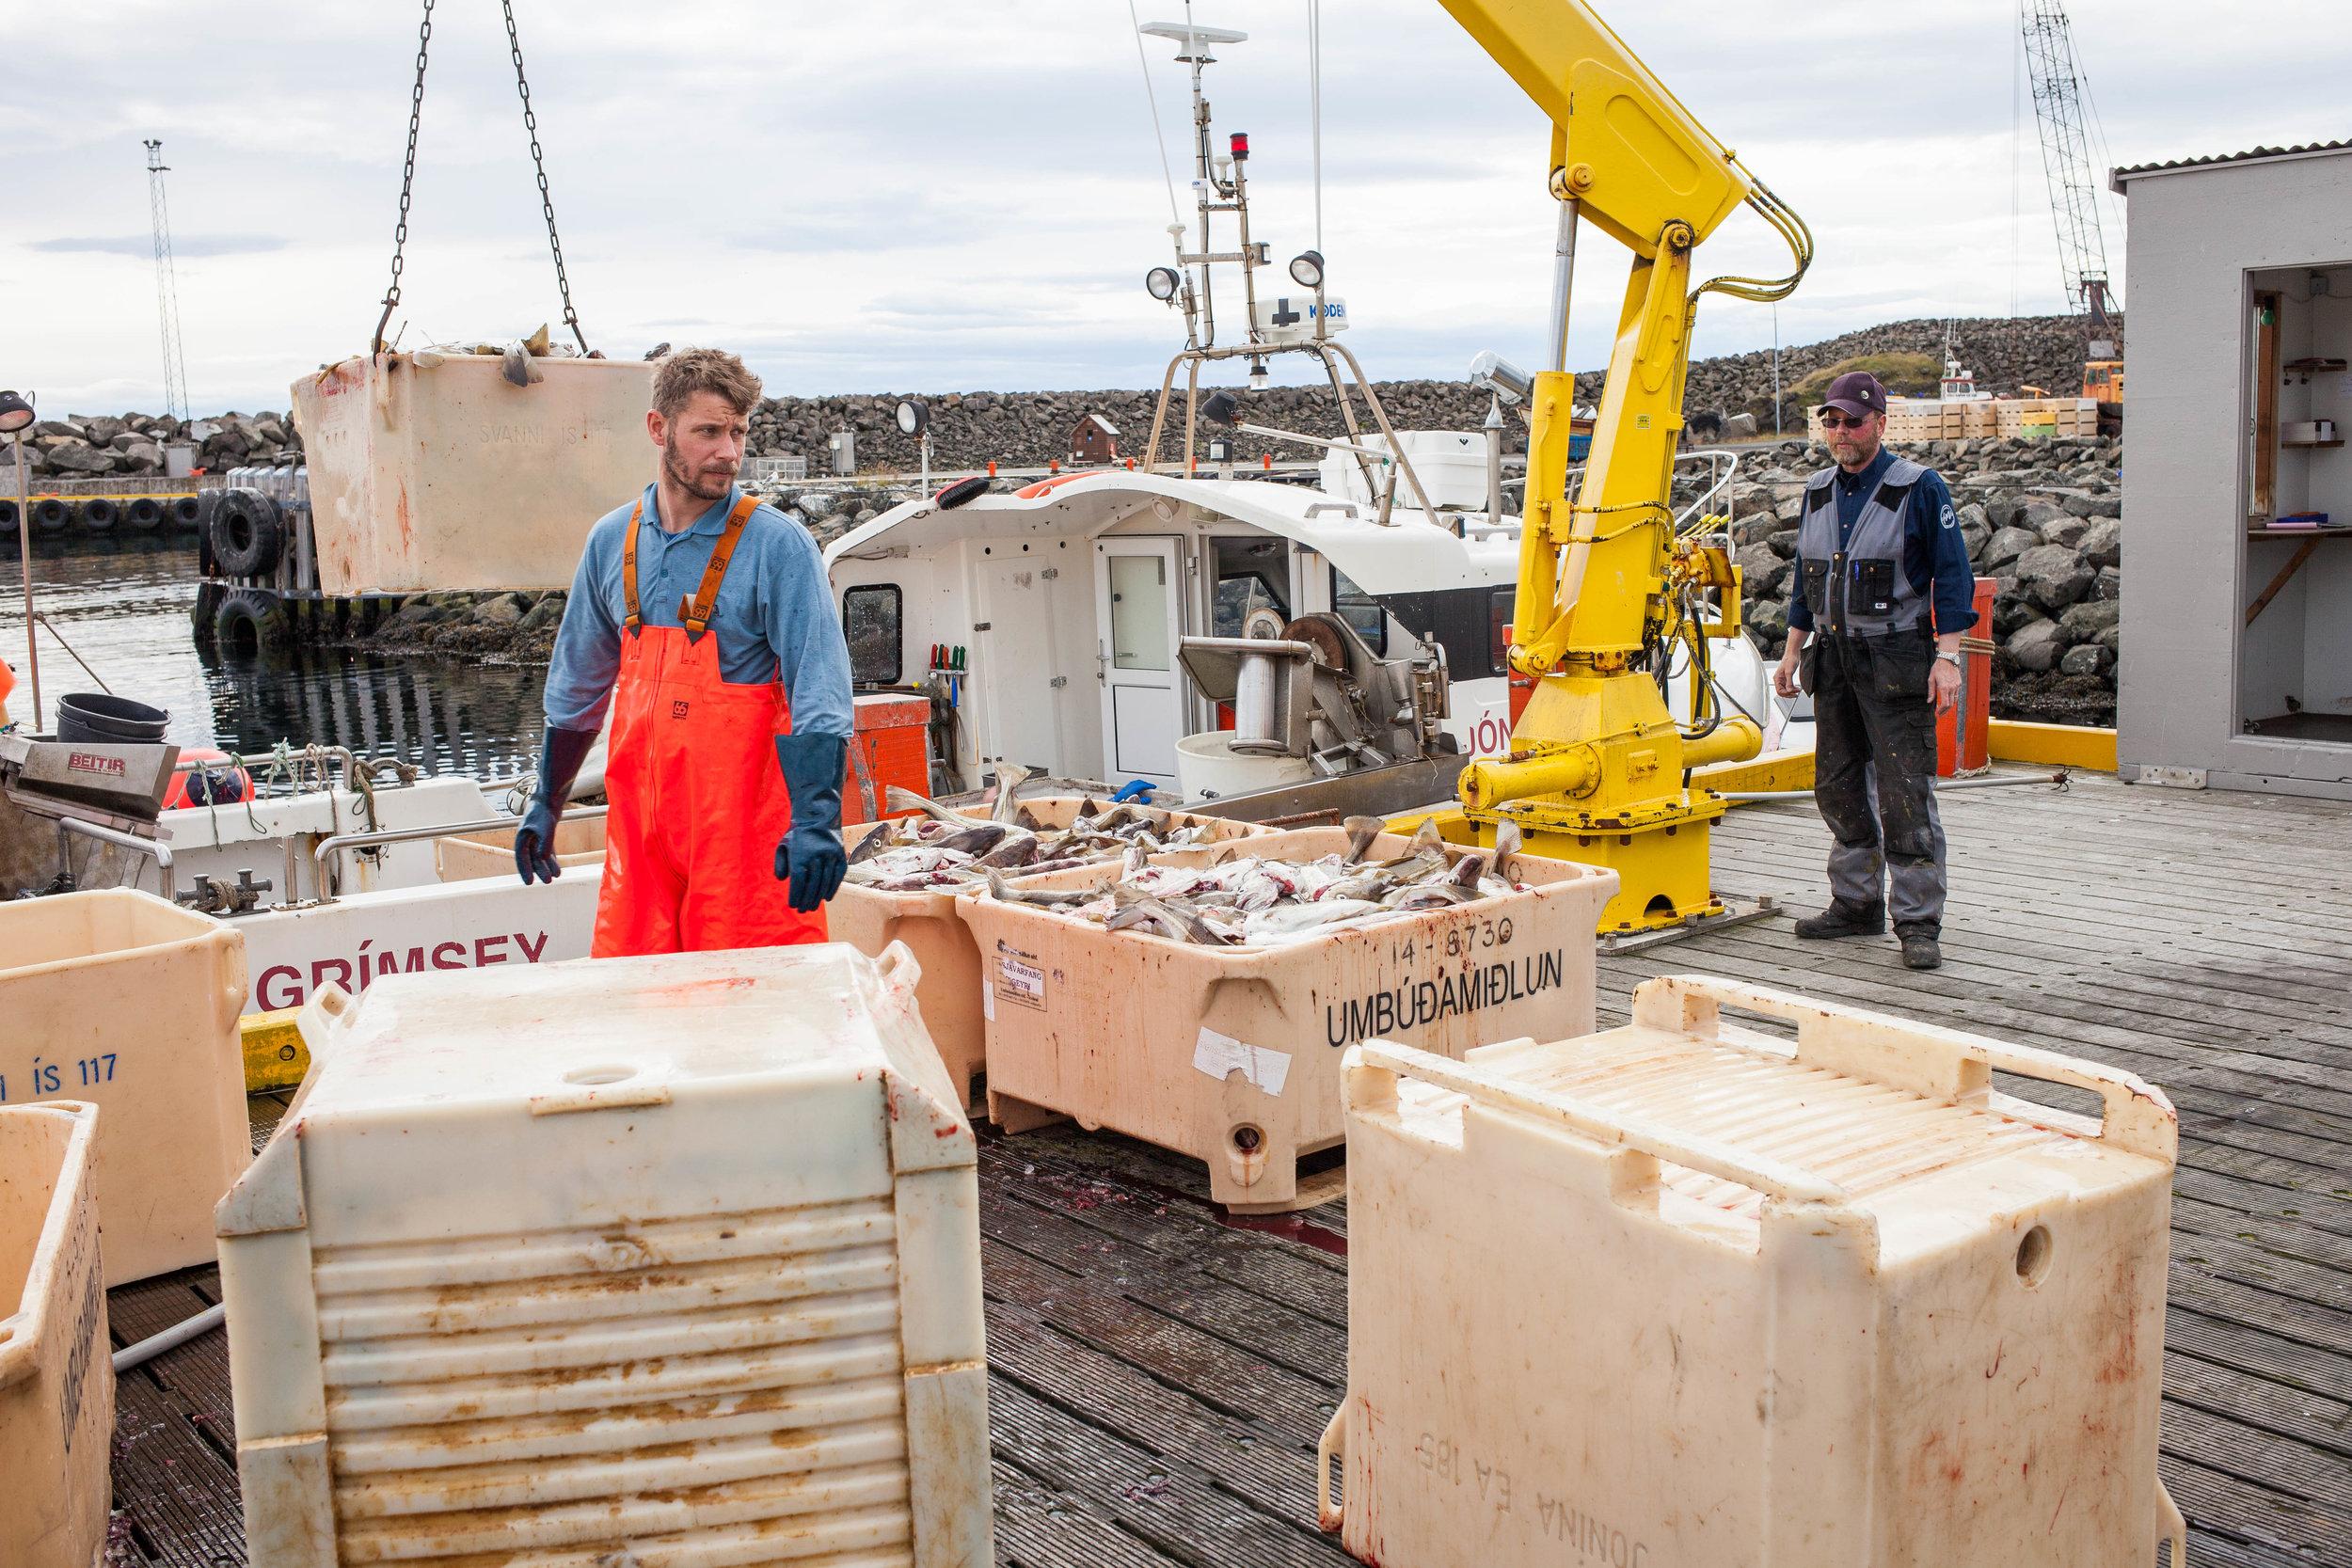 Grimsey Fishing pt. 2 WEB_2016_Katrina Jane Perry-2150.jpg